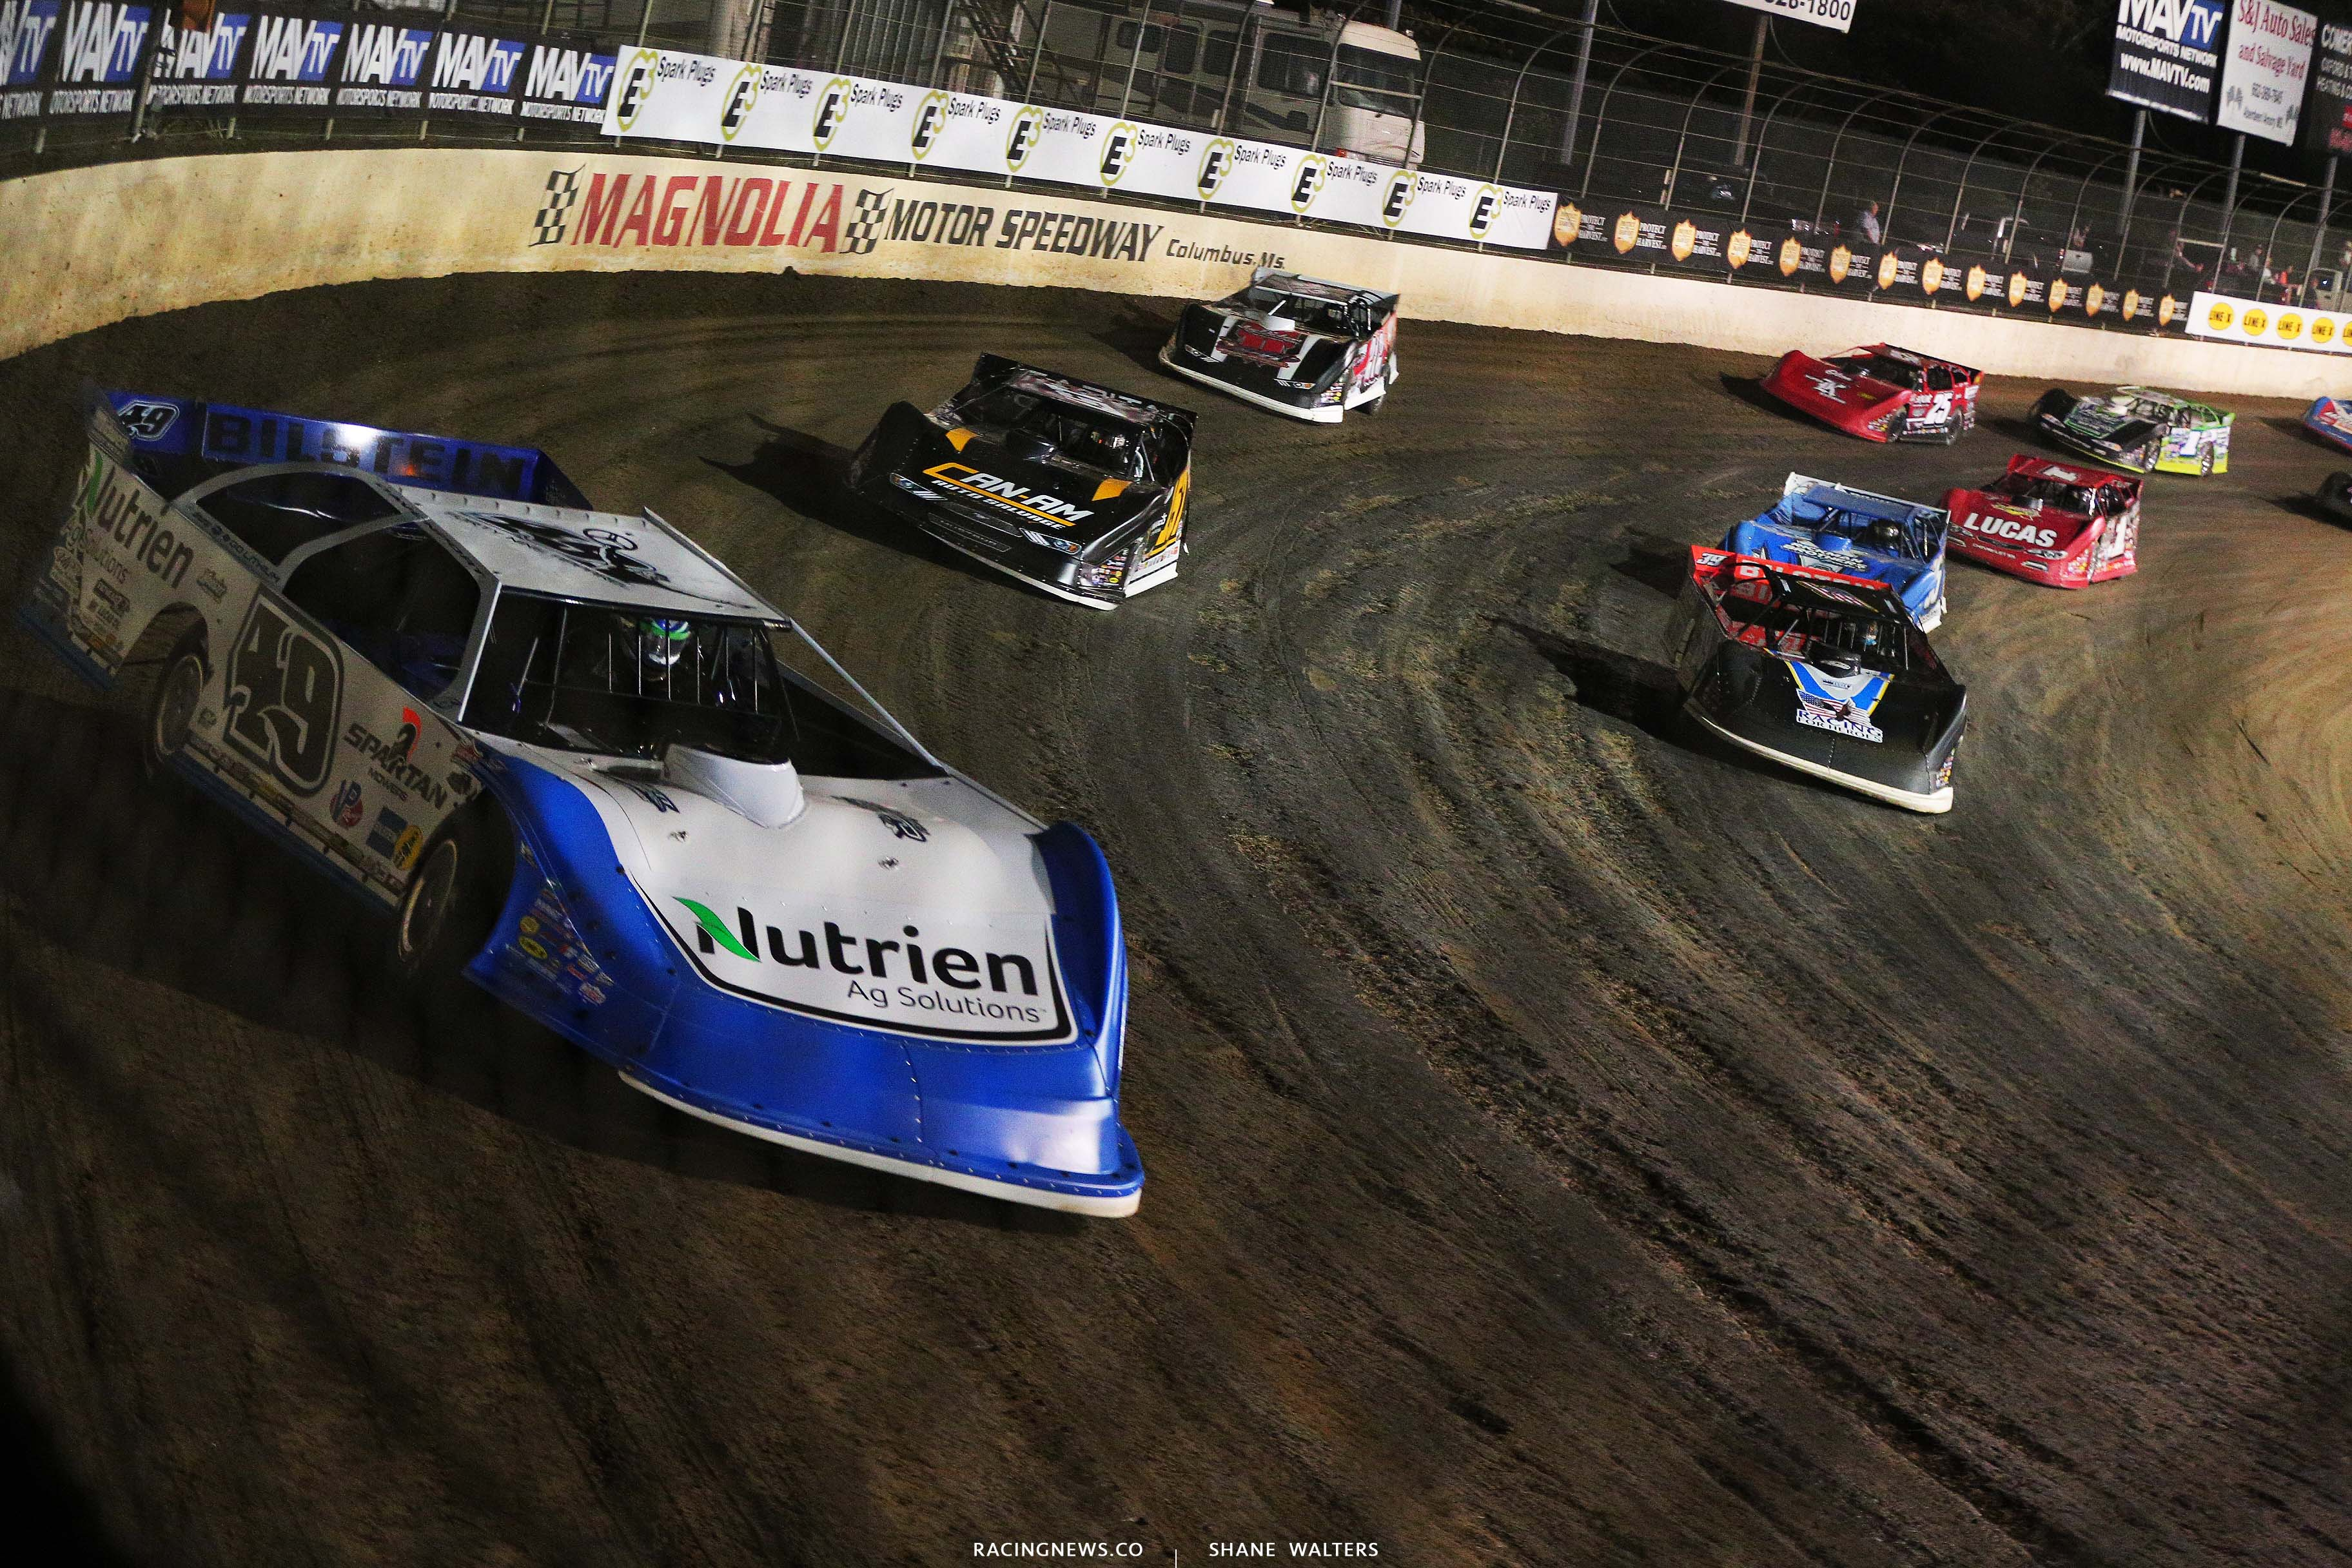 Jonathan Davenport, Mike Marlar, Tim McCreadie - Clash at the Mag - Magnolia Motor Speedway - Lucas Oil Late Model Dirt Series 6527